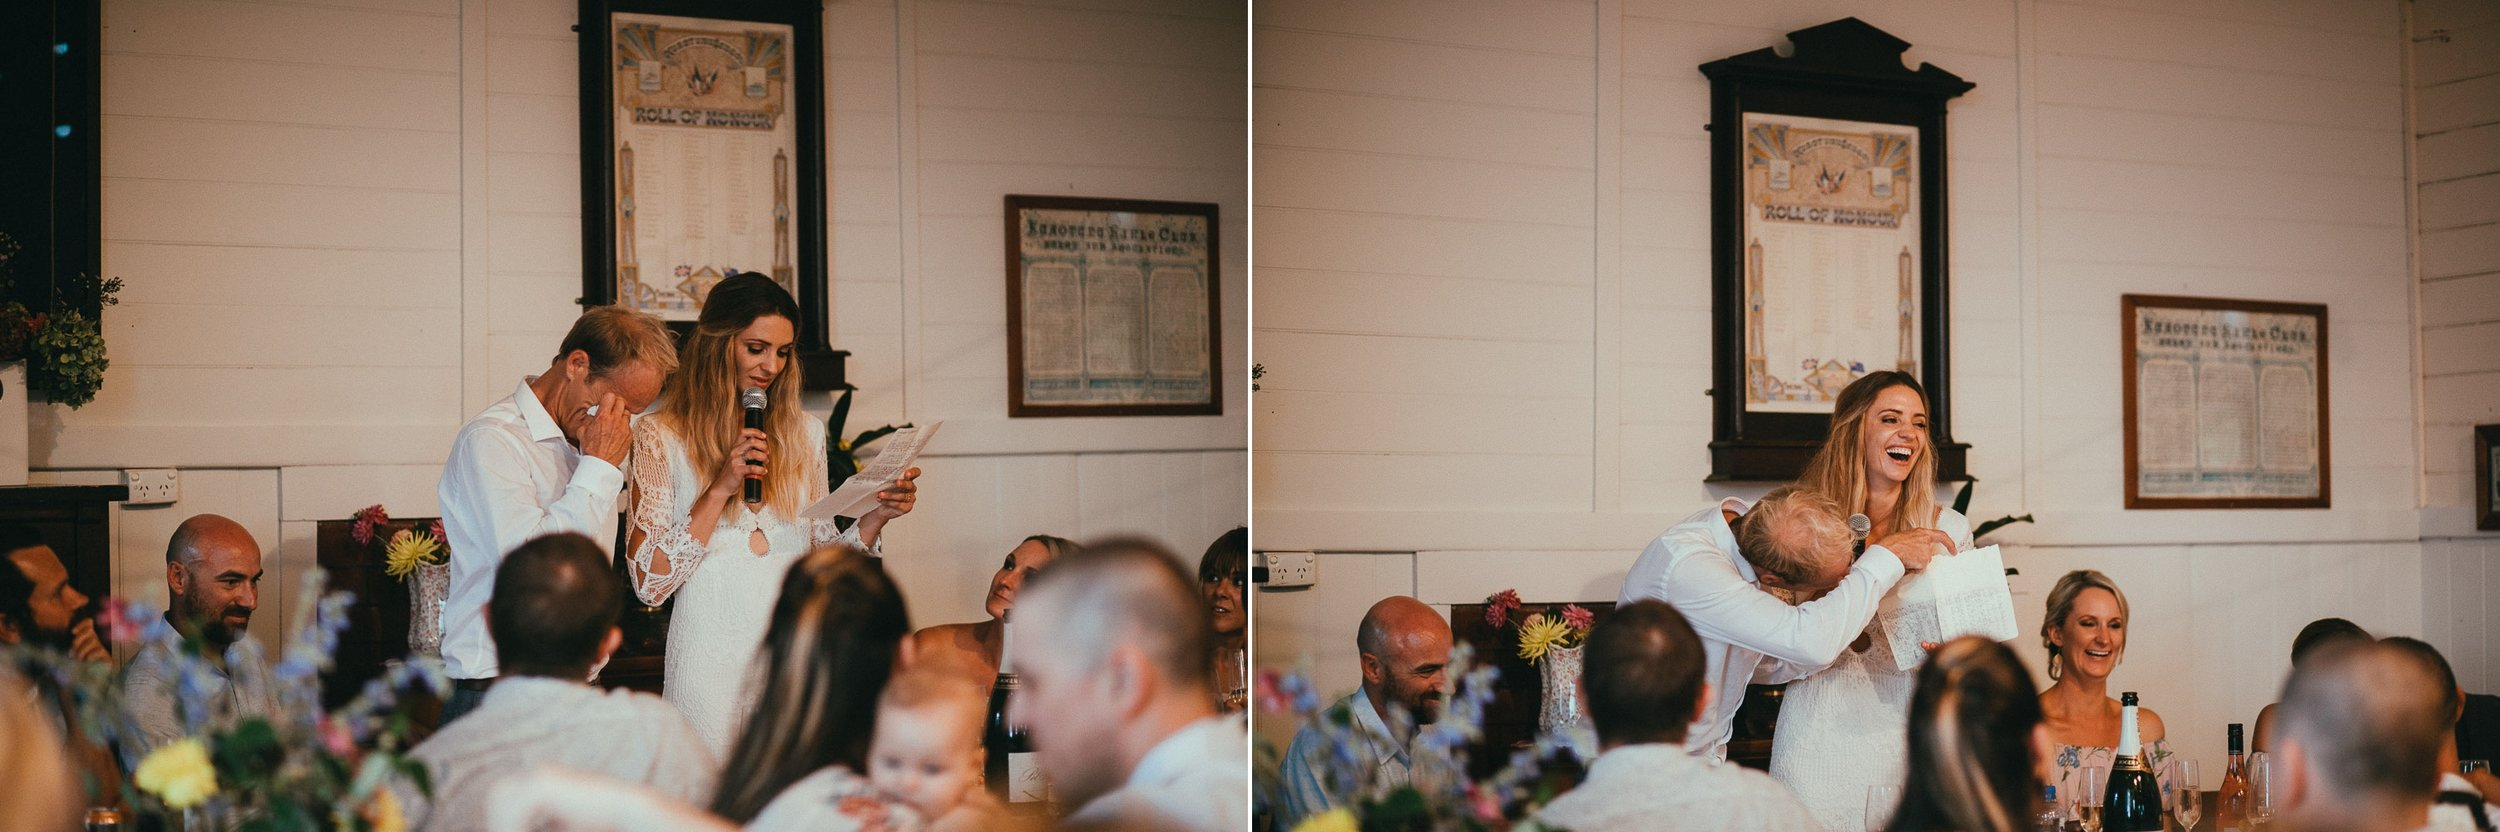 emotional-wedding-new-zealand169.jpg